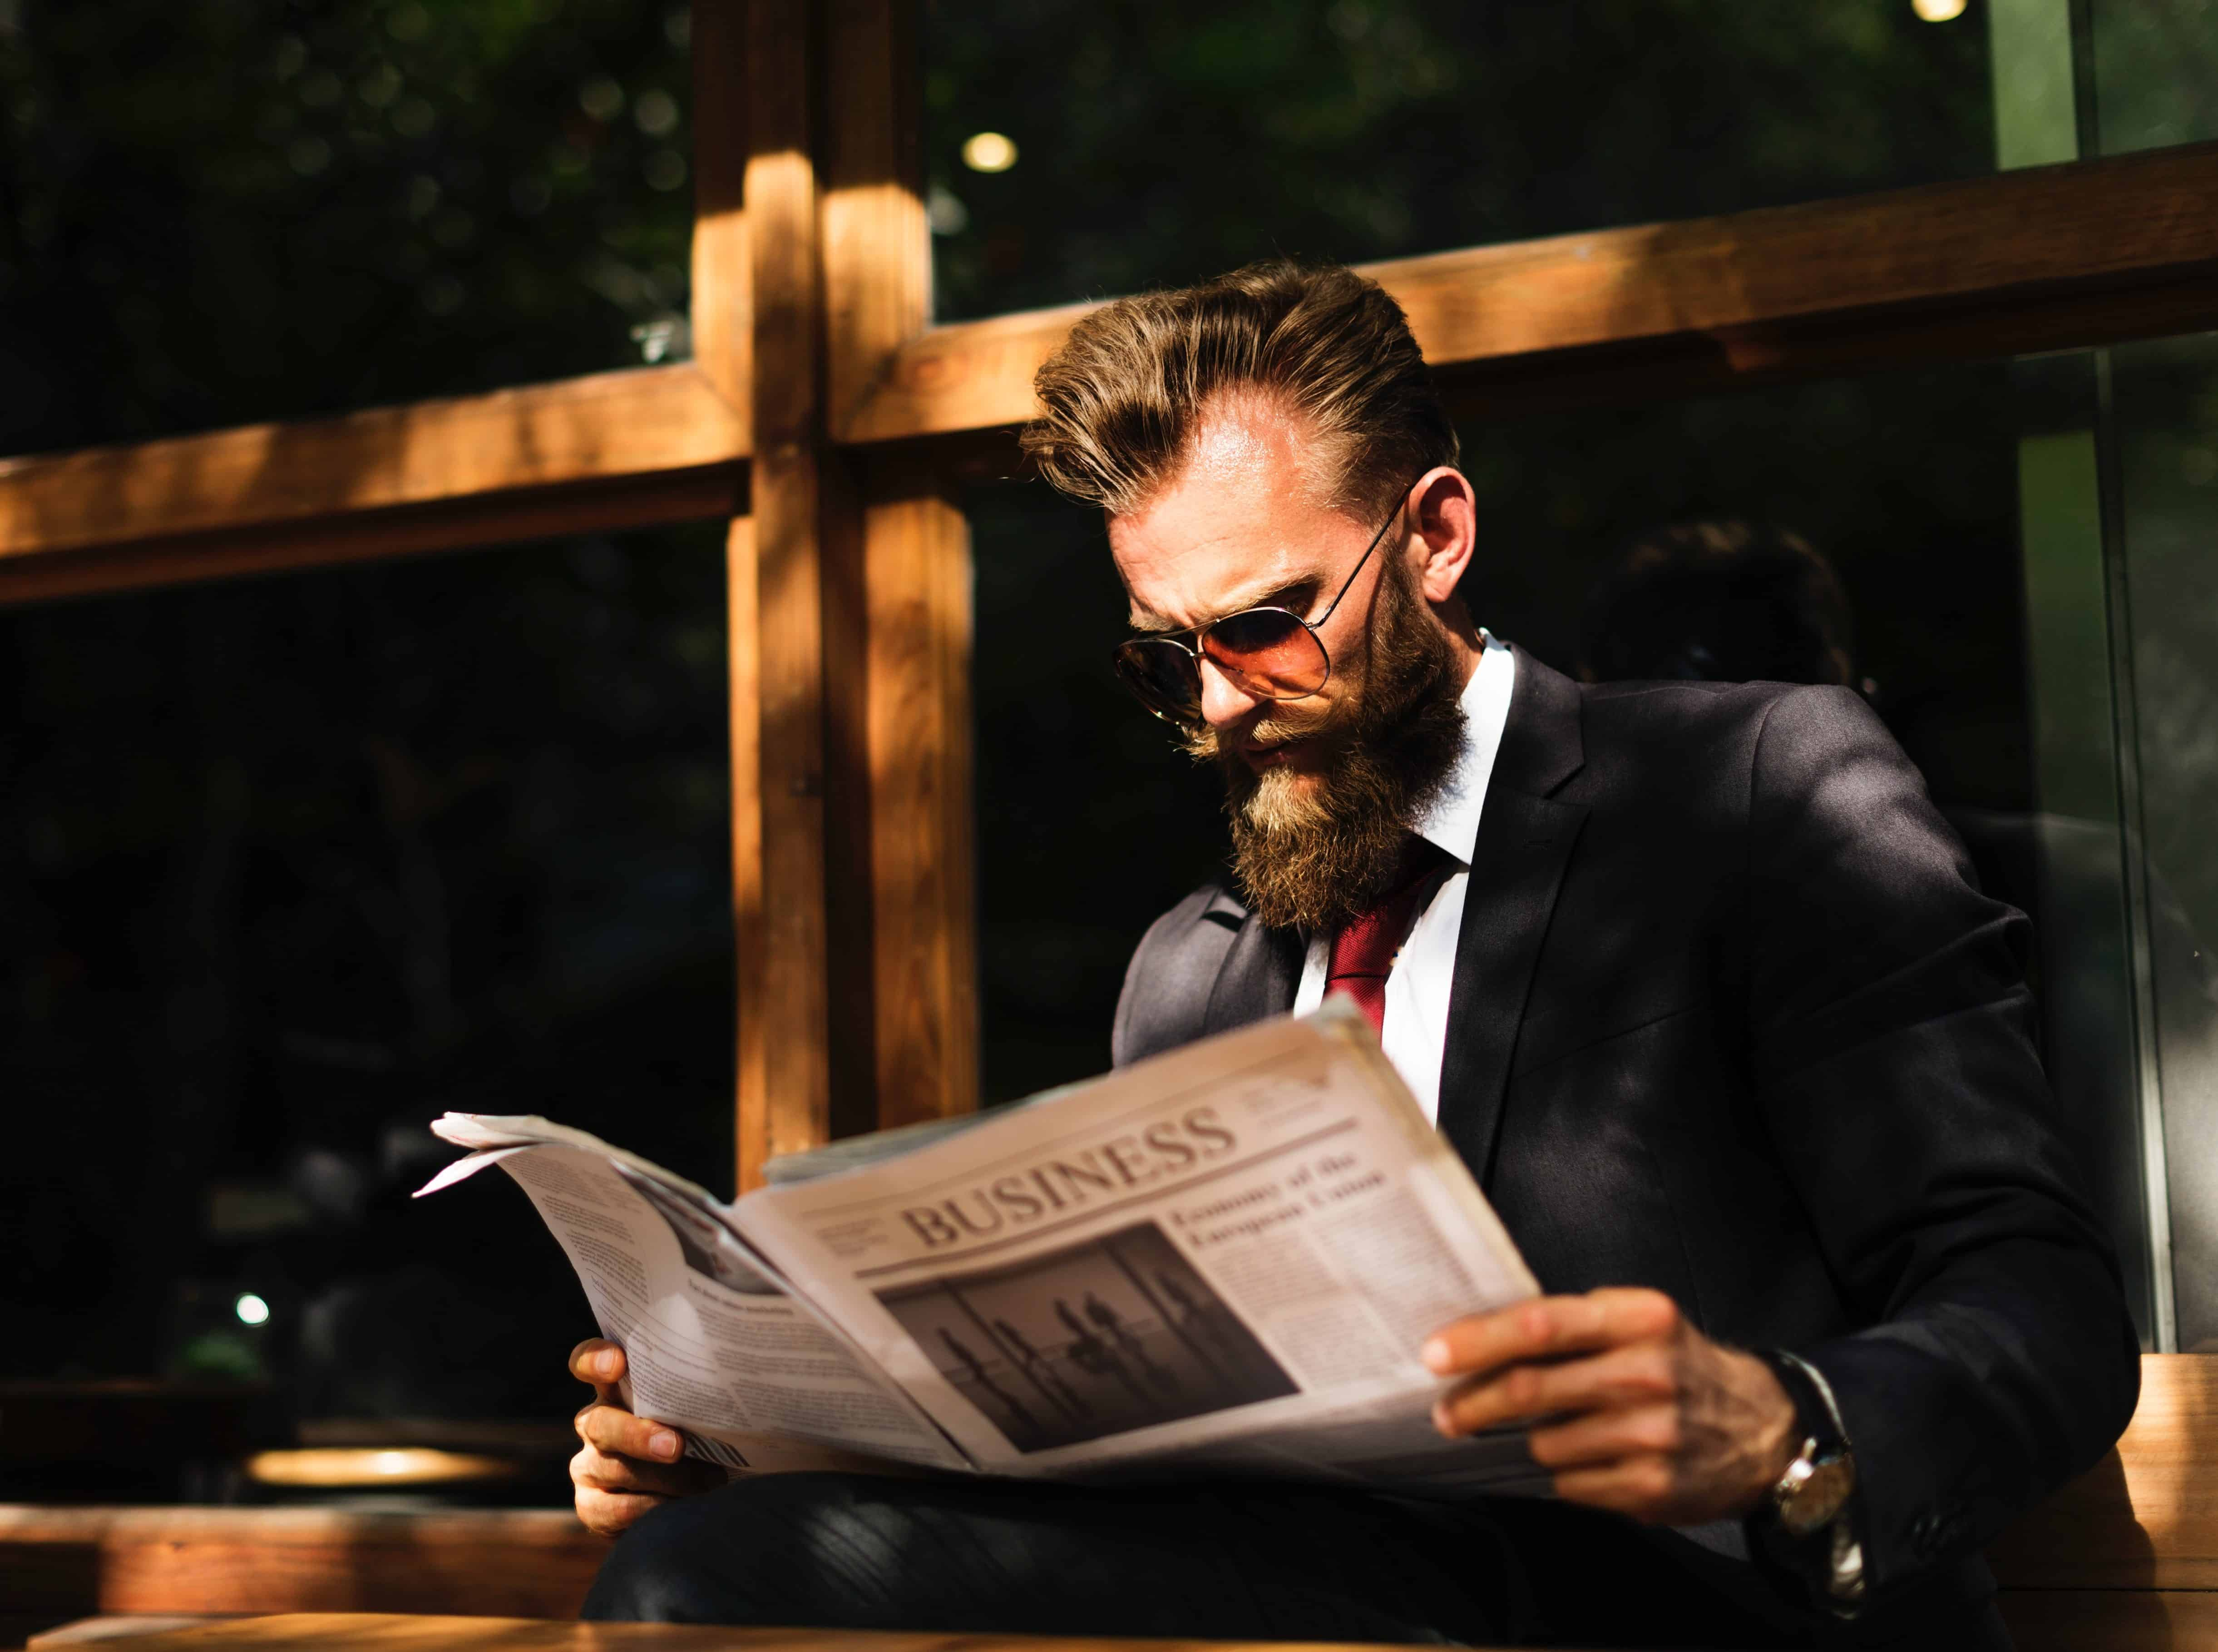 habits that make men more attractive